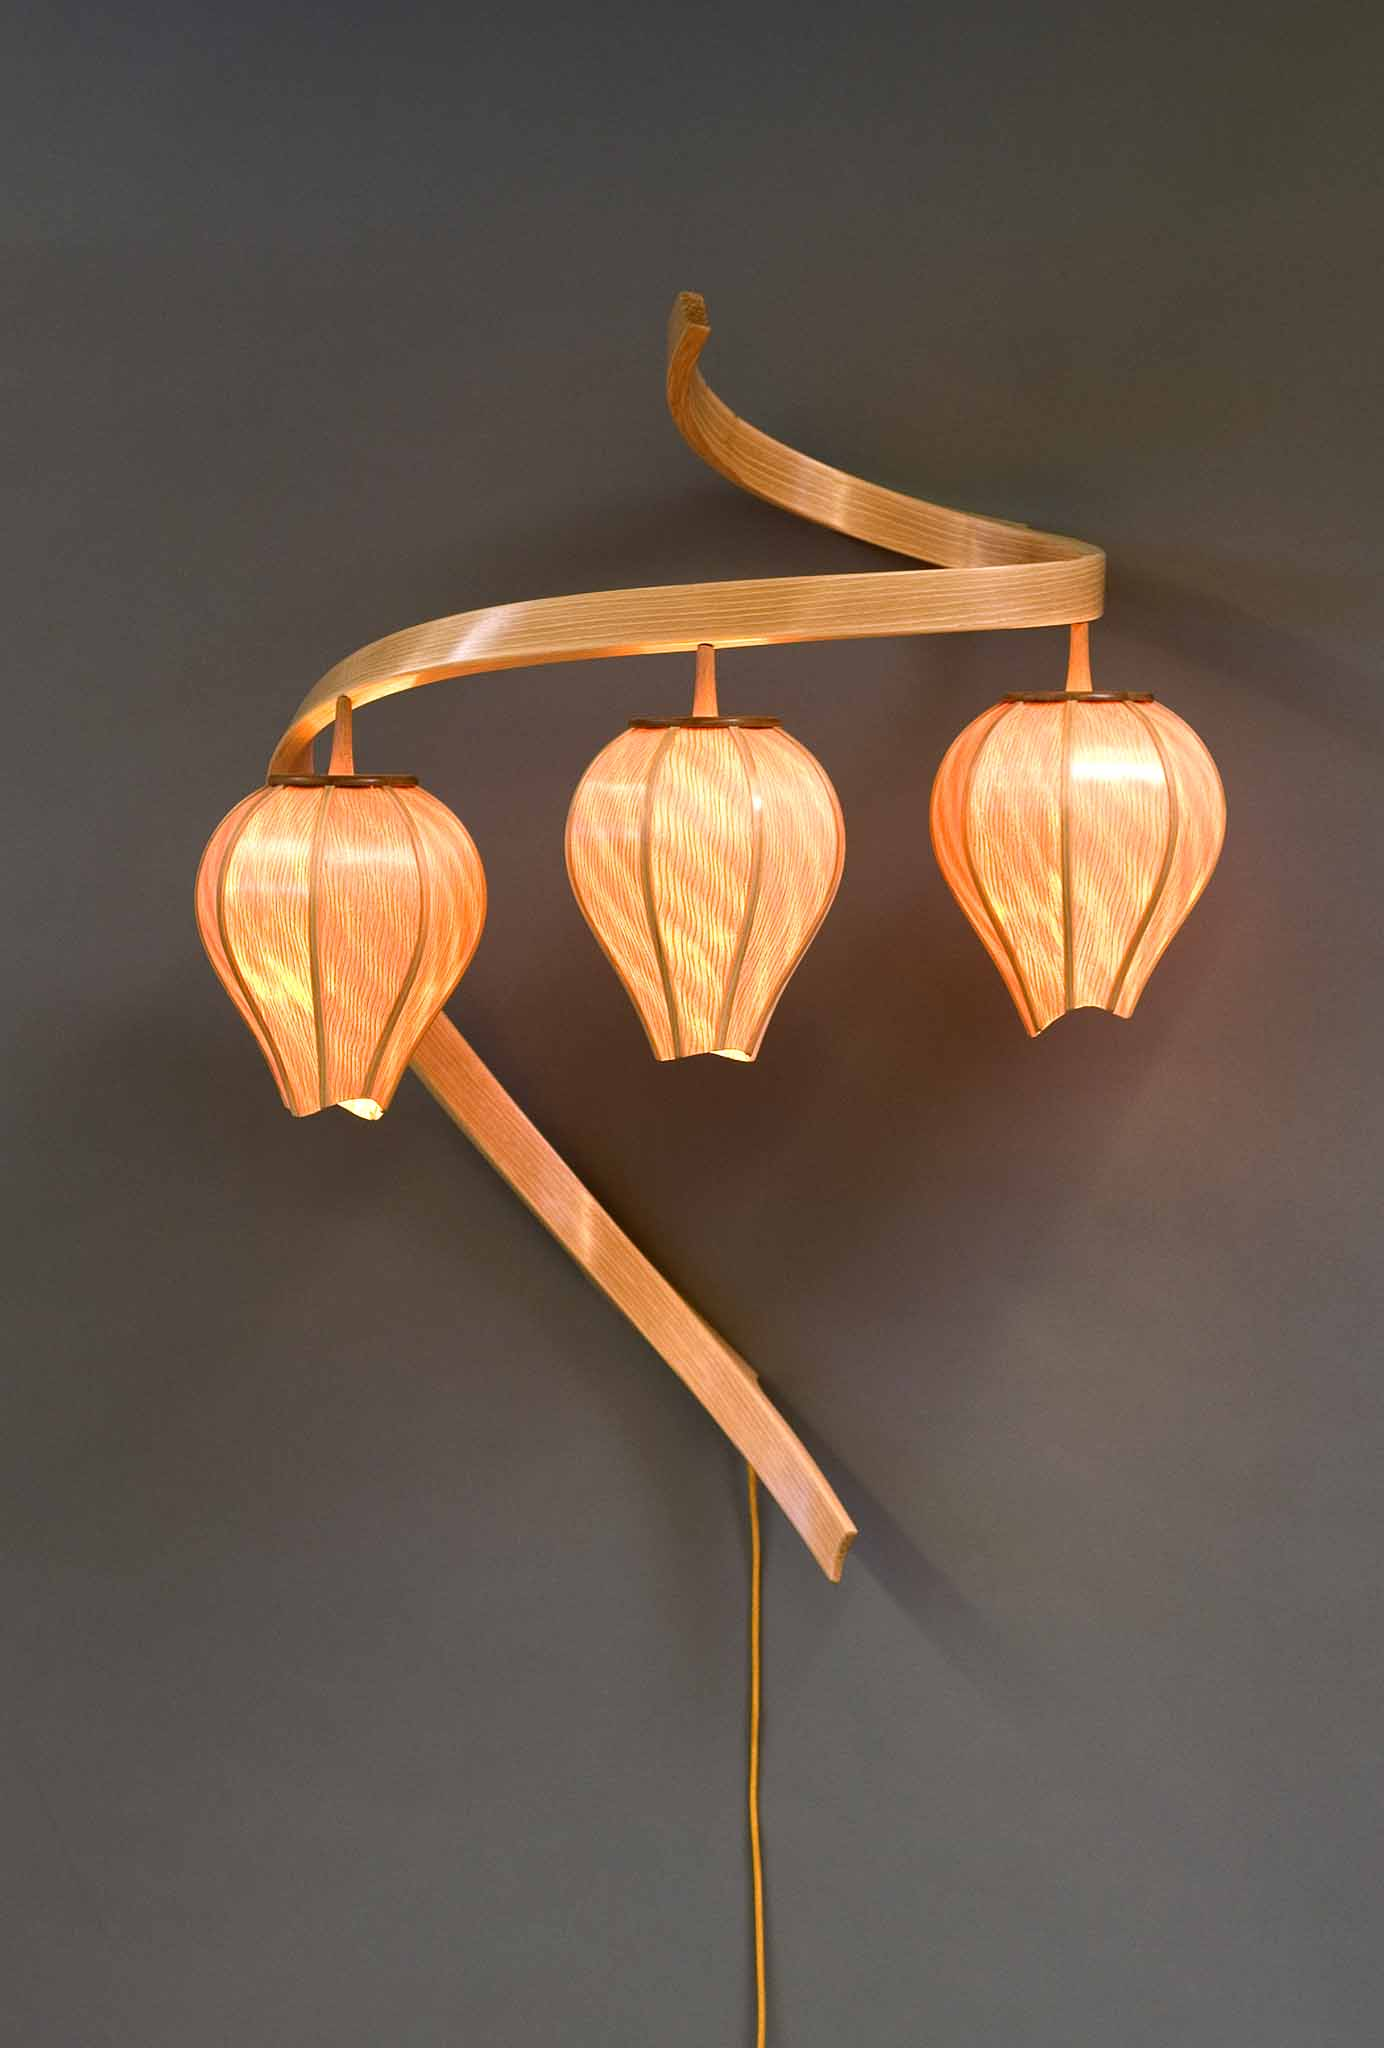 mclrnbry lamp